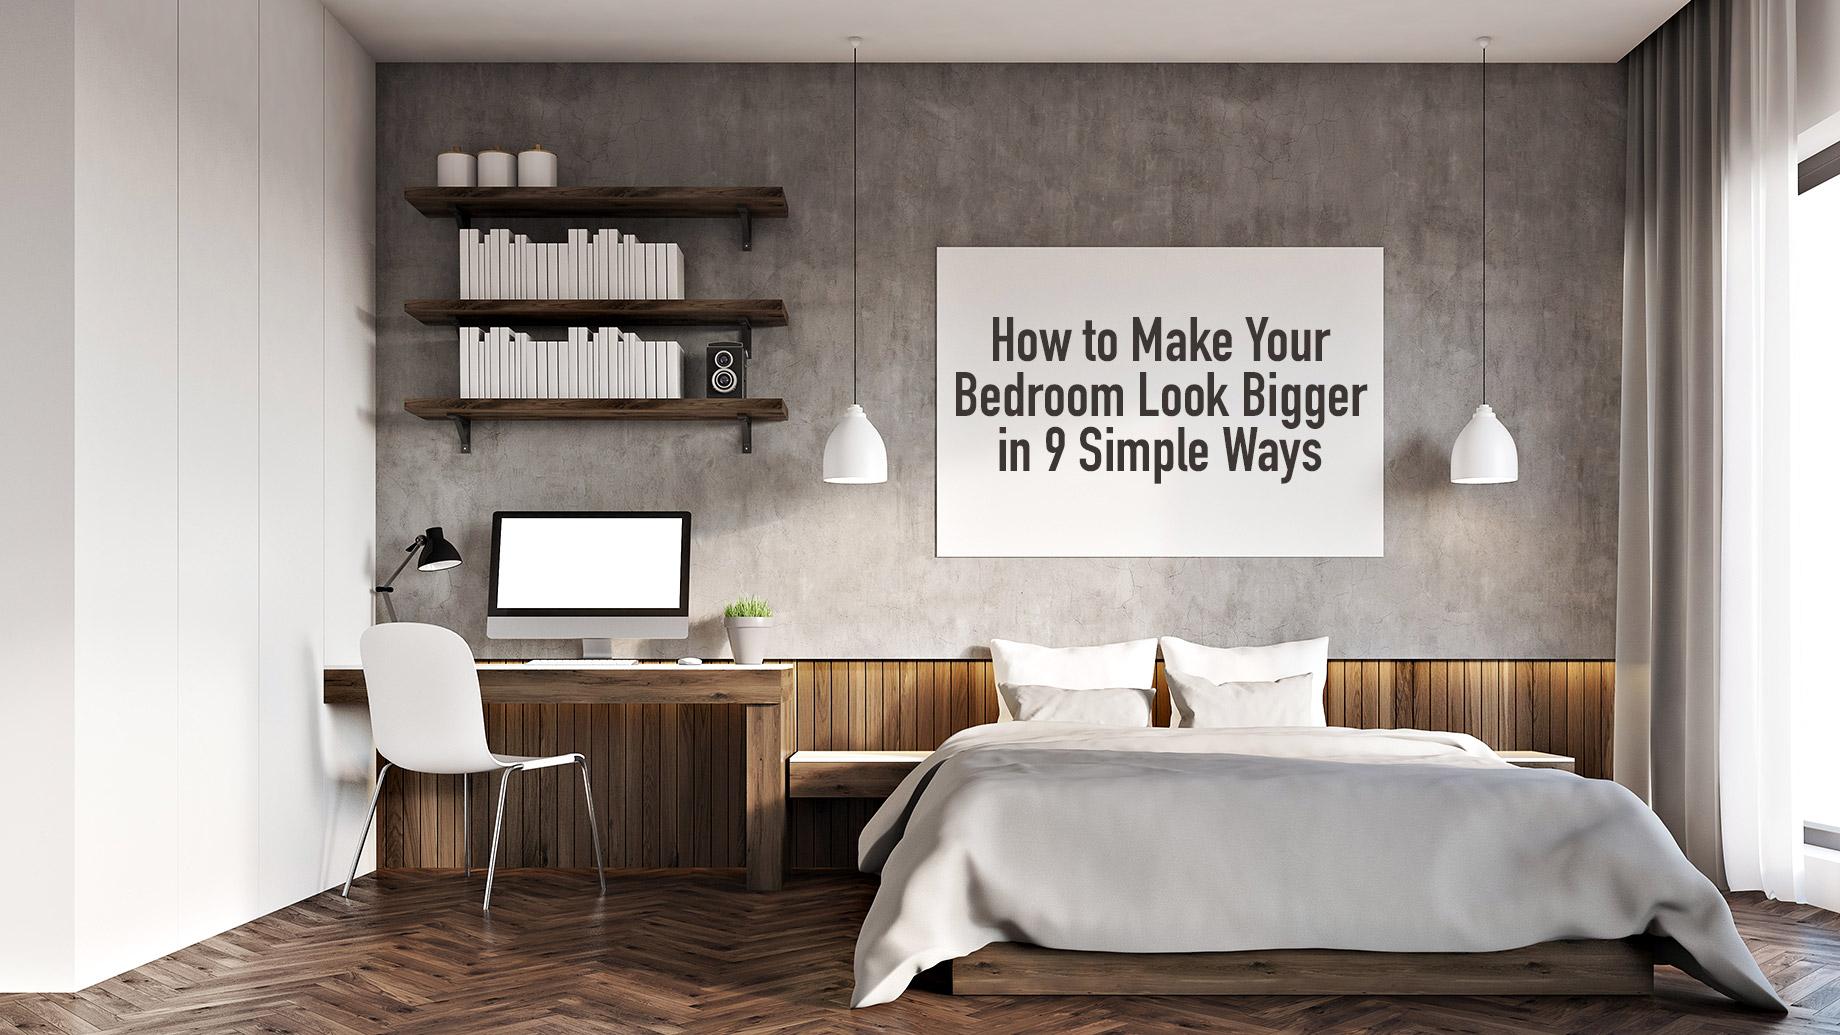 How to Make Your Bedroom Look Bigger in 9 Simple Ways